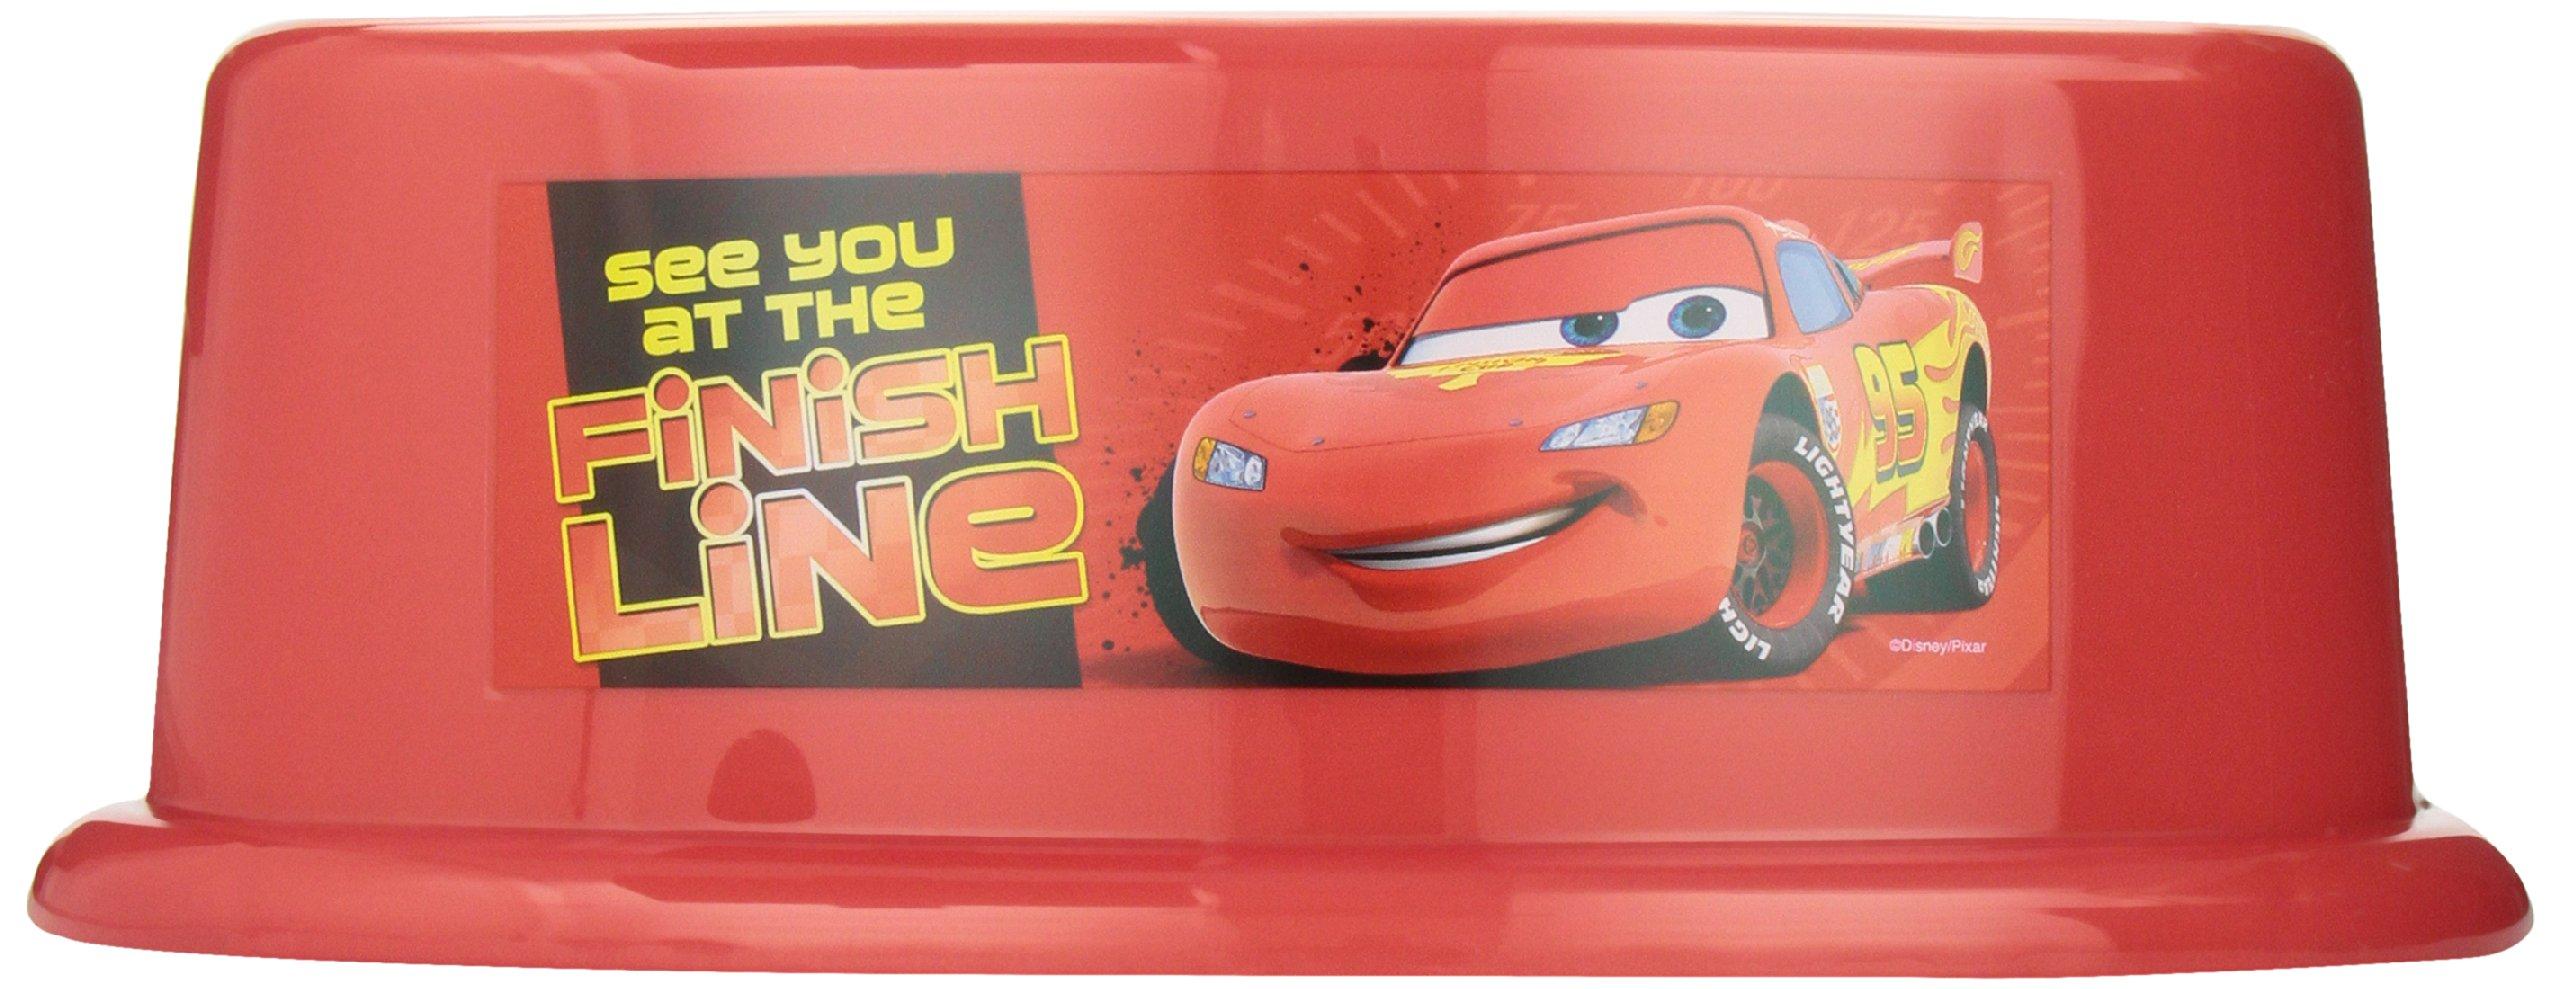 Amazon Com Disney Pixar Cars Lightining Mcqueen Toilet